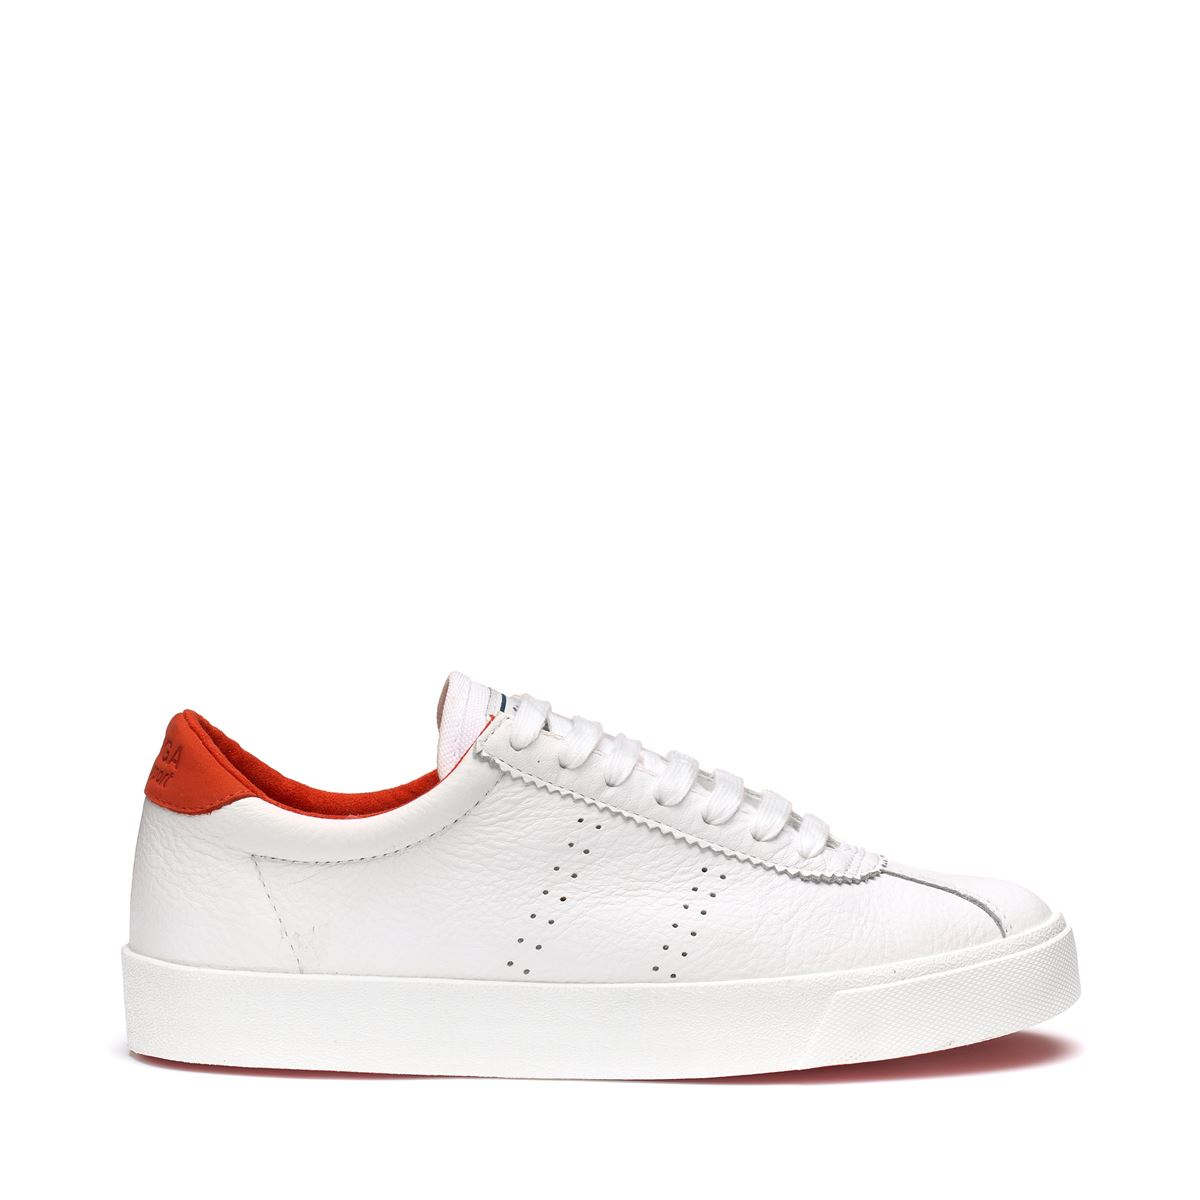 Superga Shoes Sneakers 2843-COMFLEAU Man Woman Low Cut